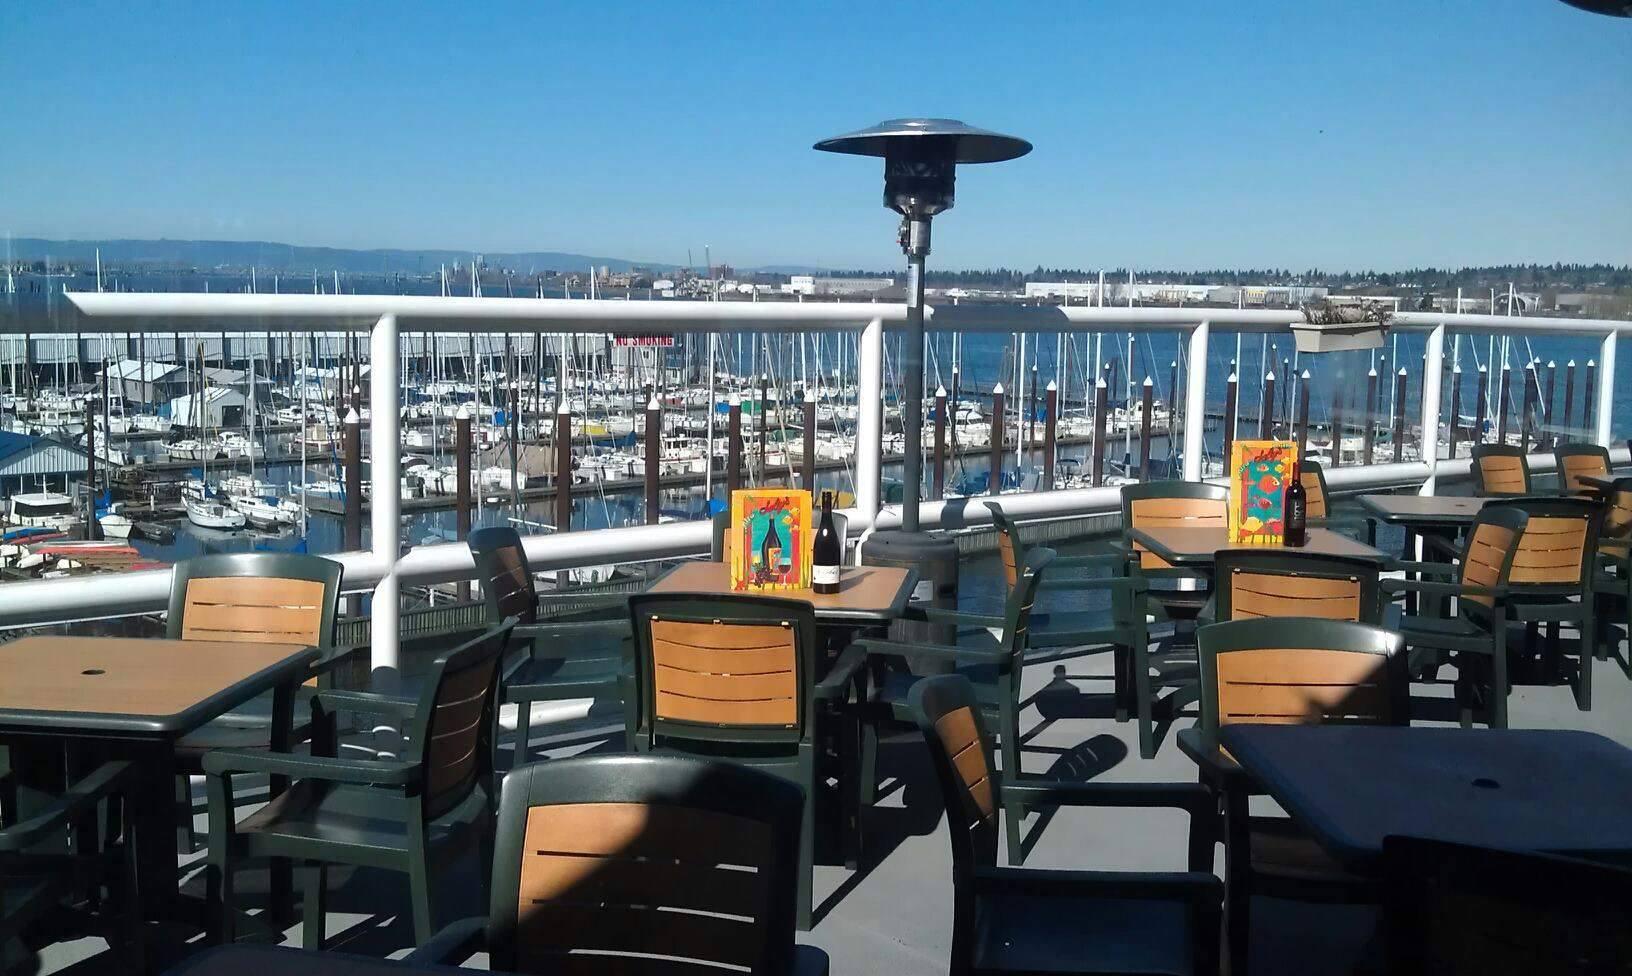 7 BEST Restaurants On The River In Portland